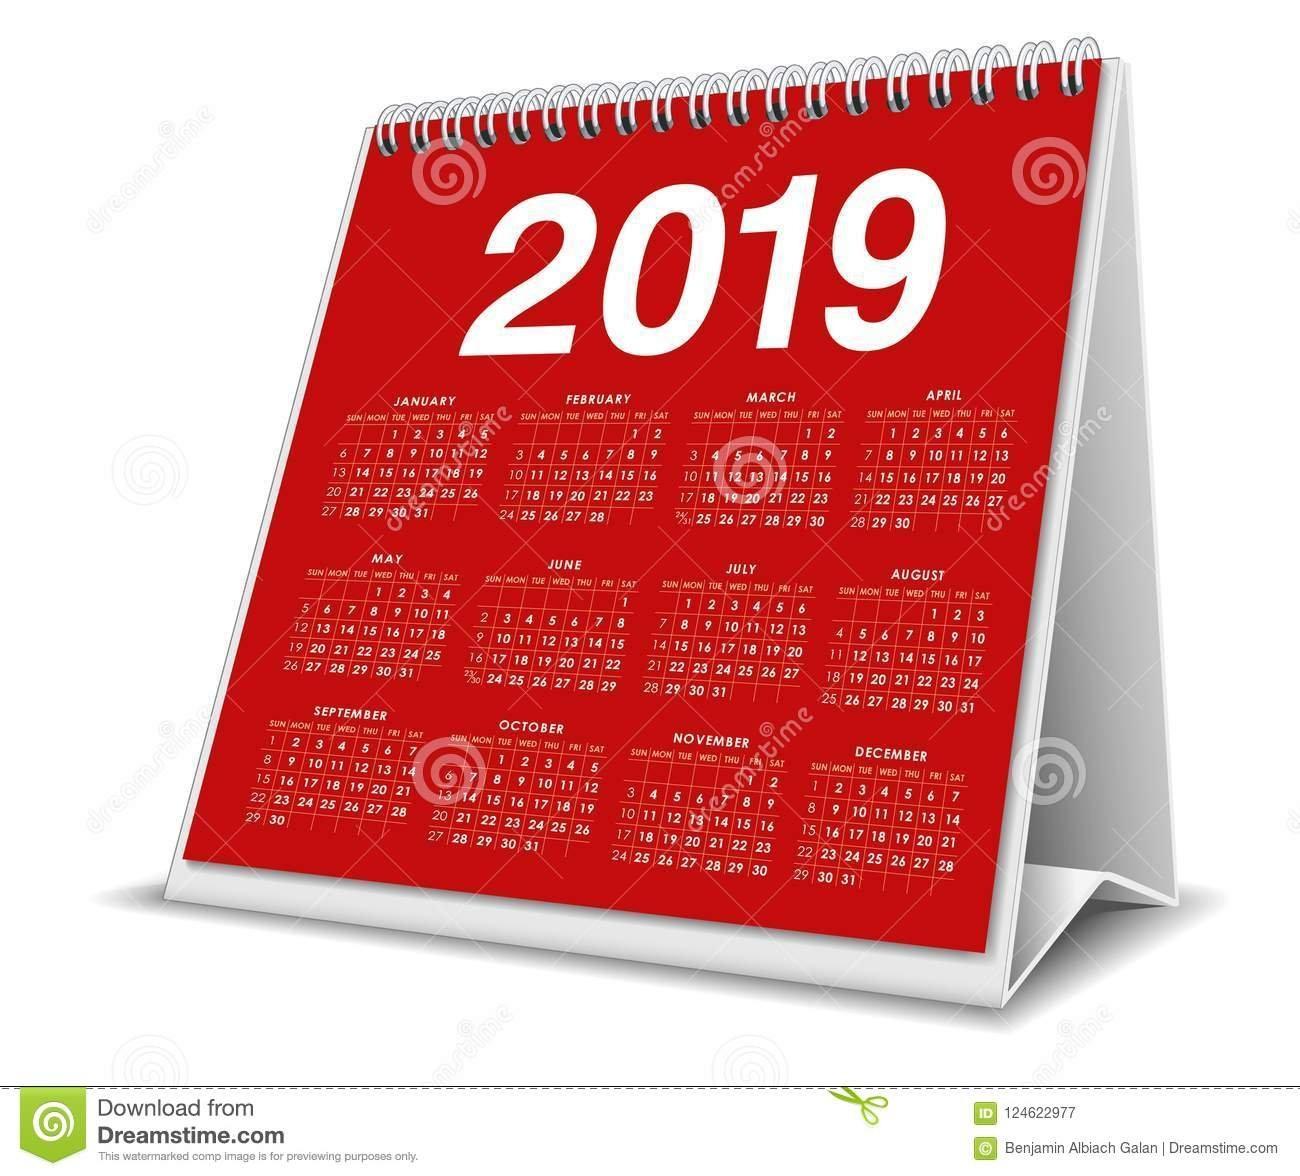 Calendar Desktop 2019 In Red Color Stock Vector – Illustration Of Calendar 2019 3D